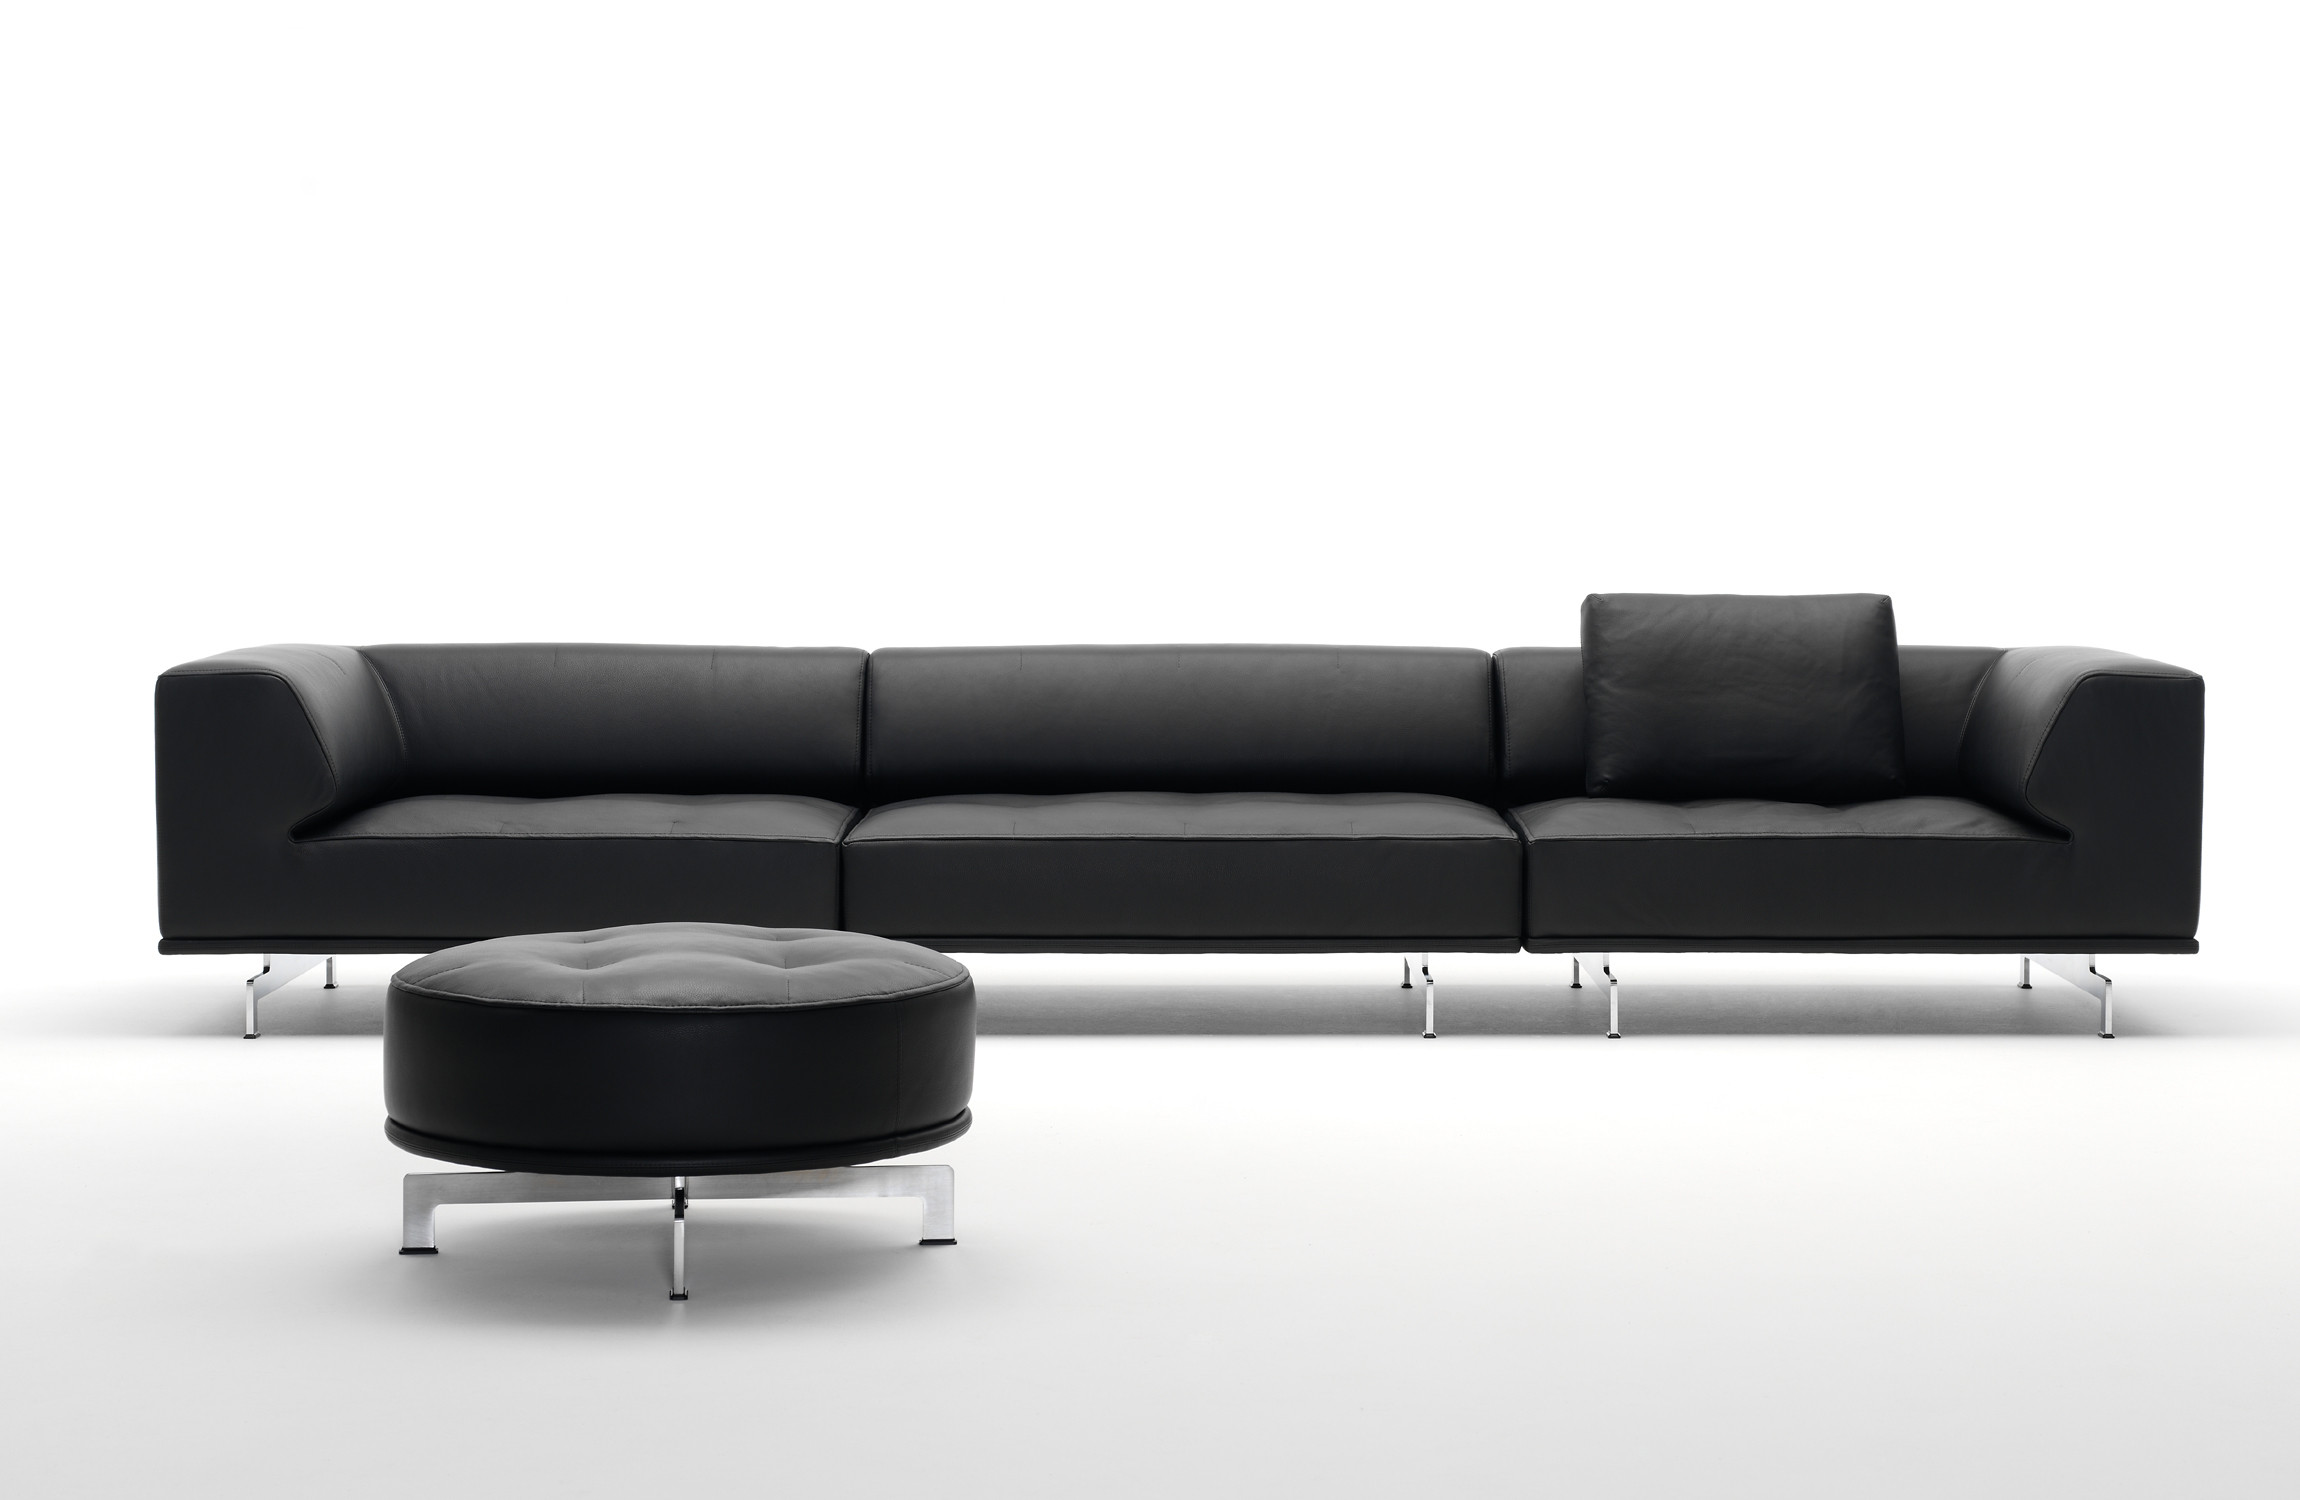 EJ 450 Delphi Sofa and Pouffe